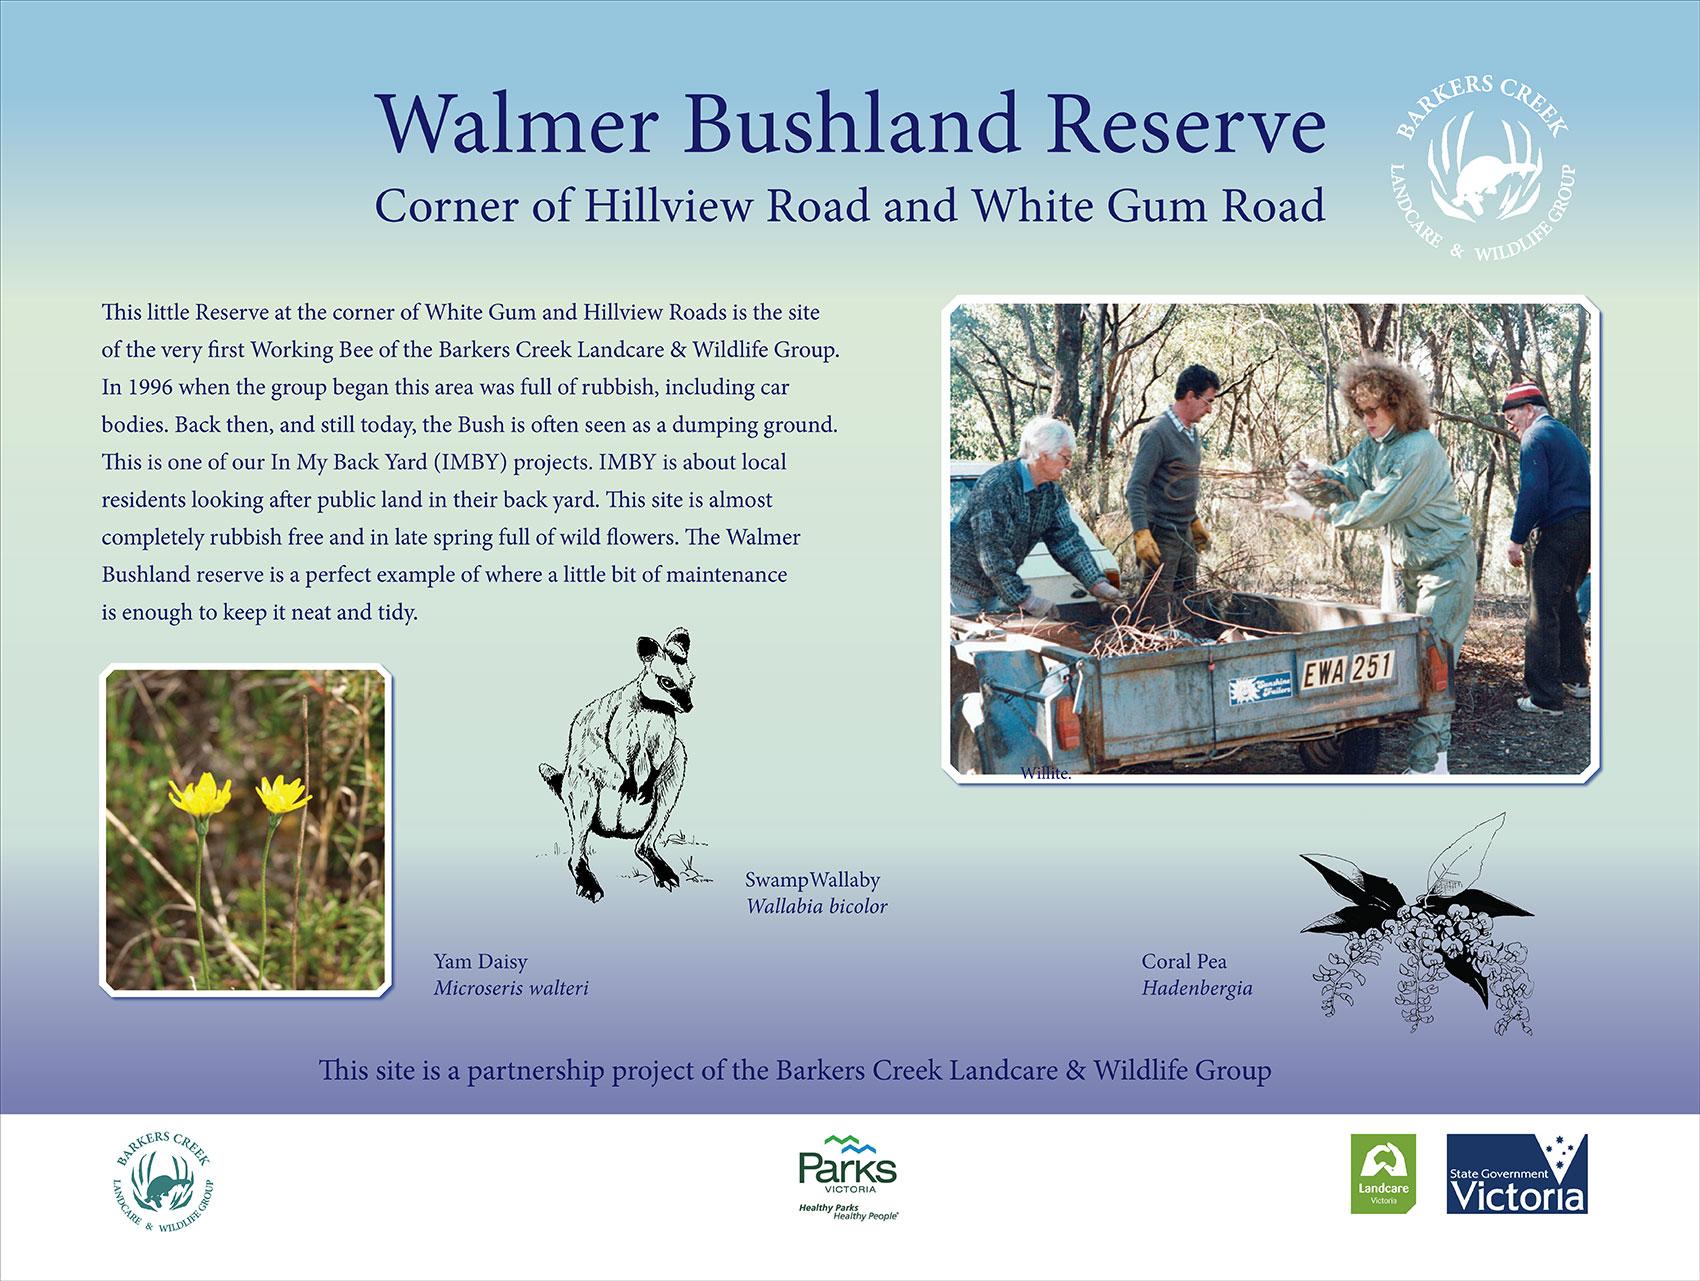 Signage at Walmer Bushland Reserve